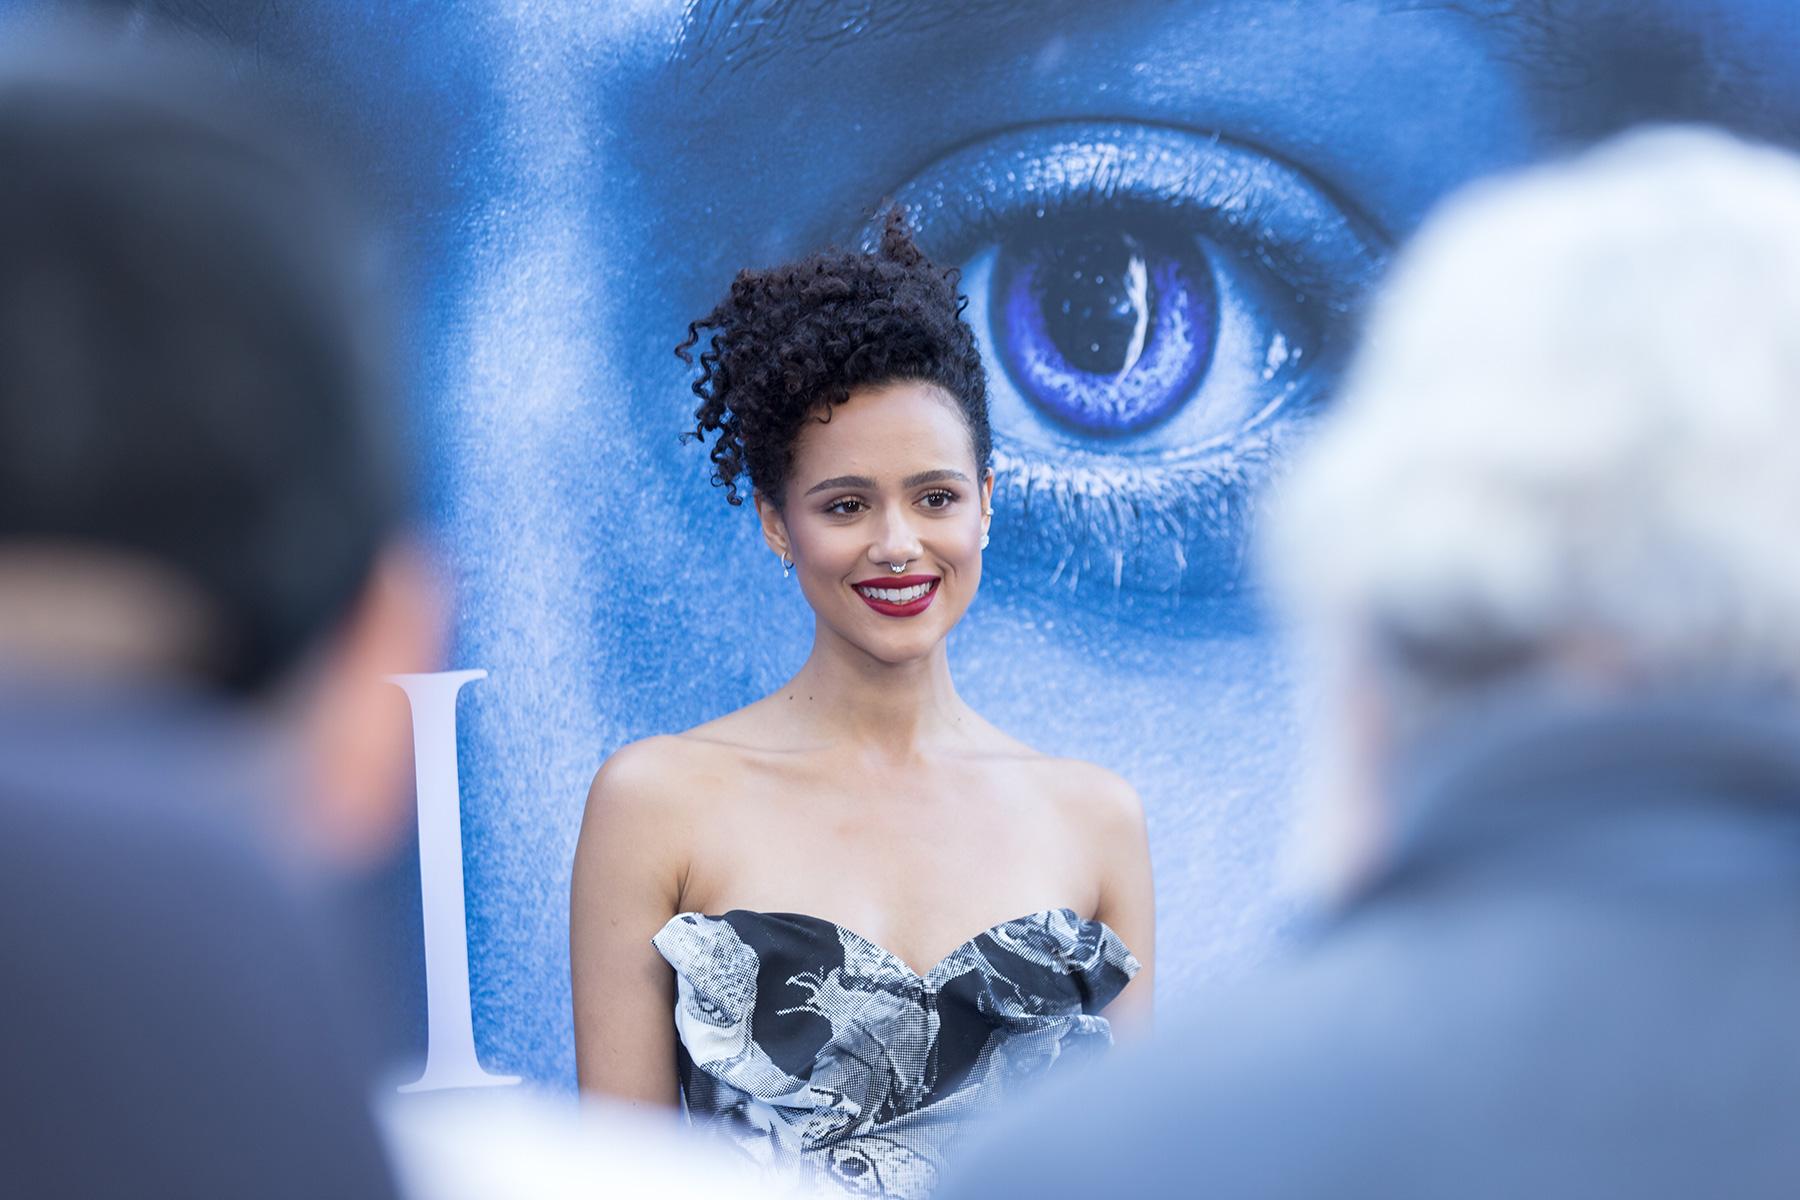 Nathalie Emmanuel of 'Game of Thrones' Is a Stunner